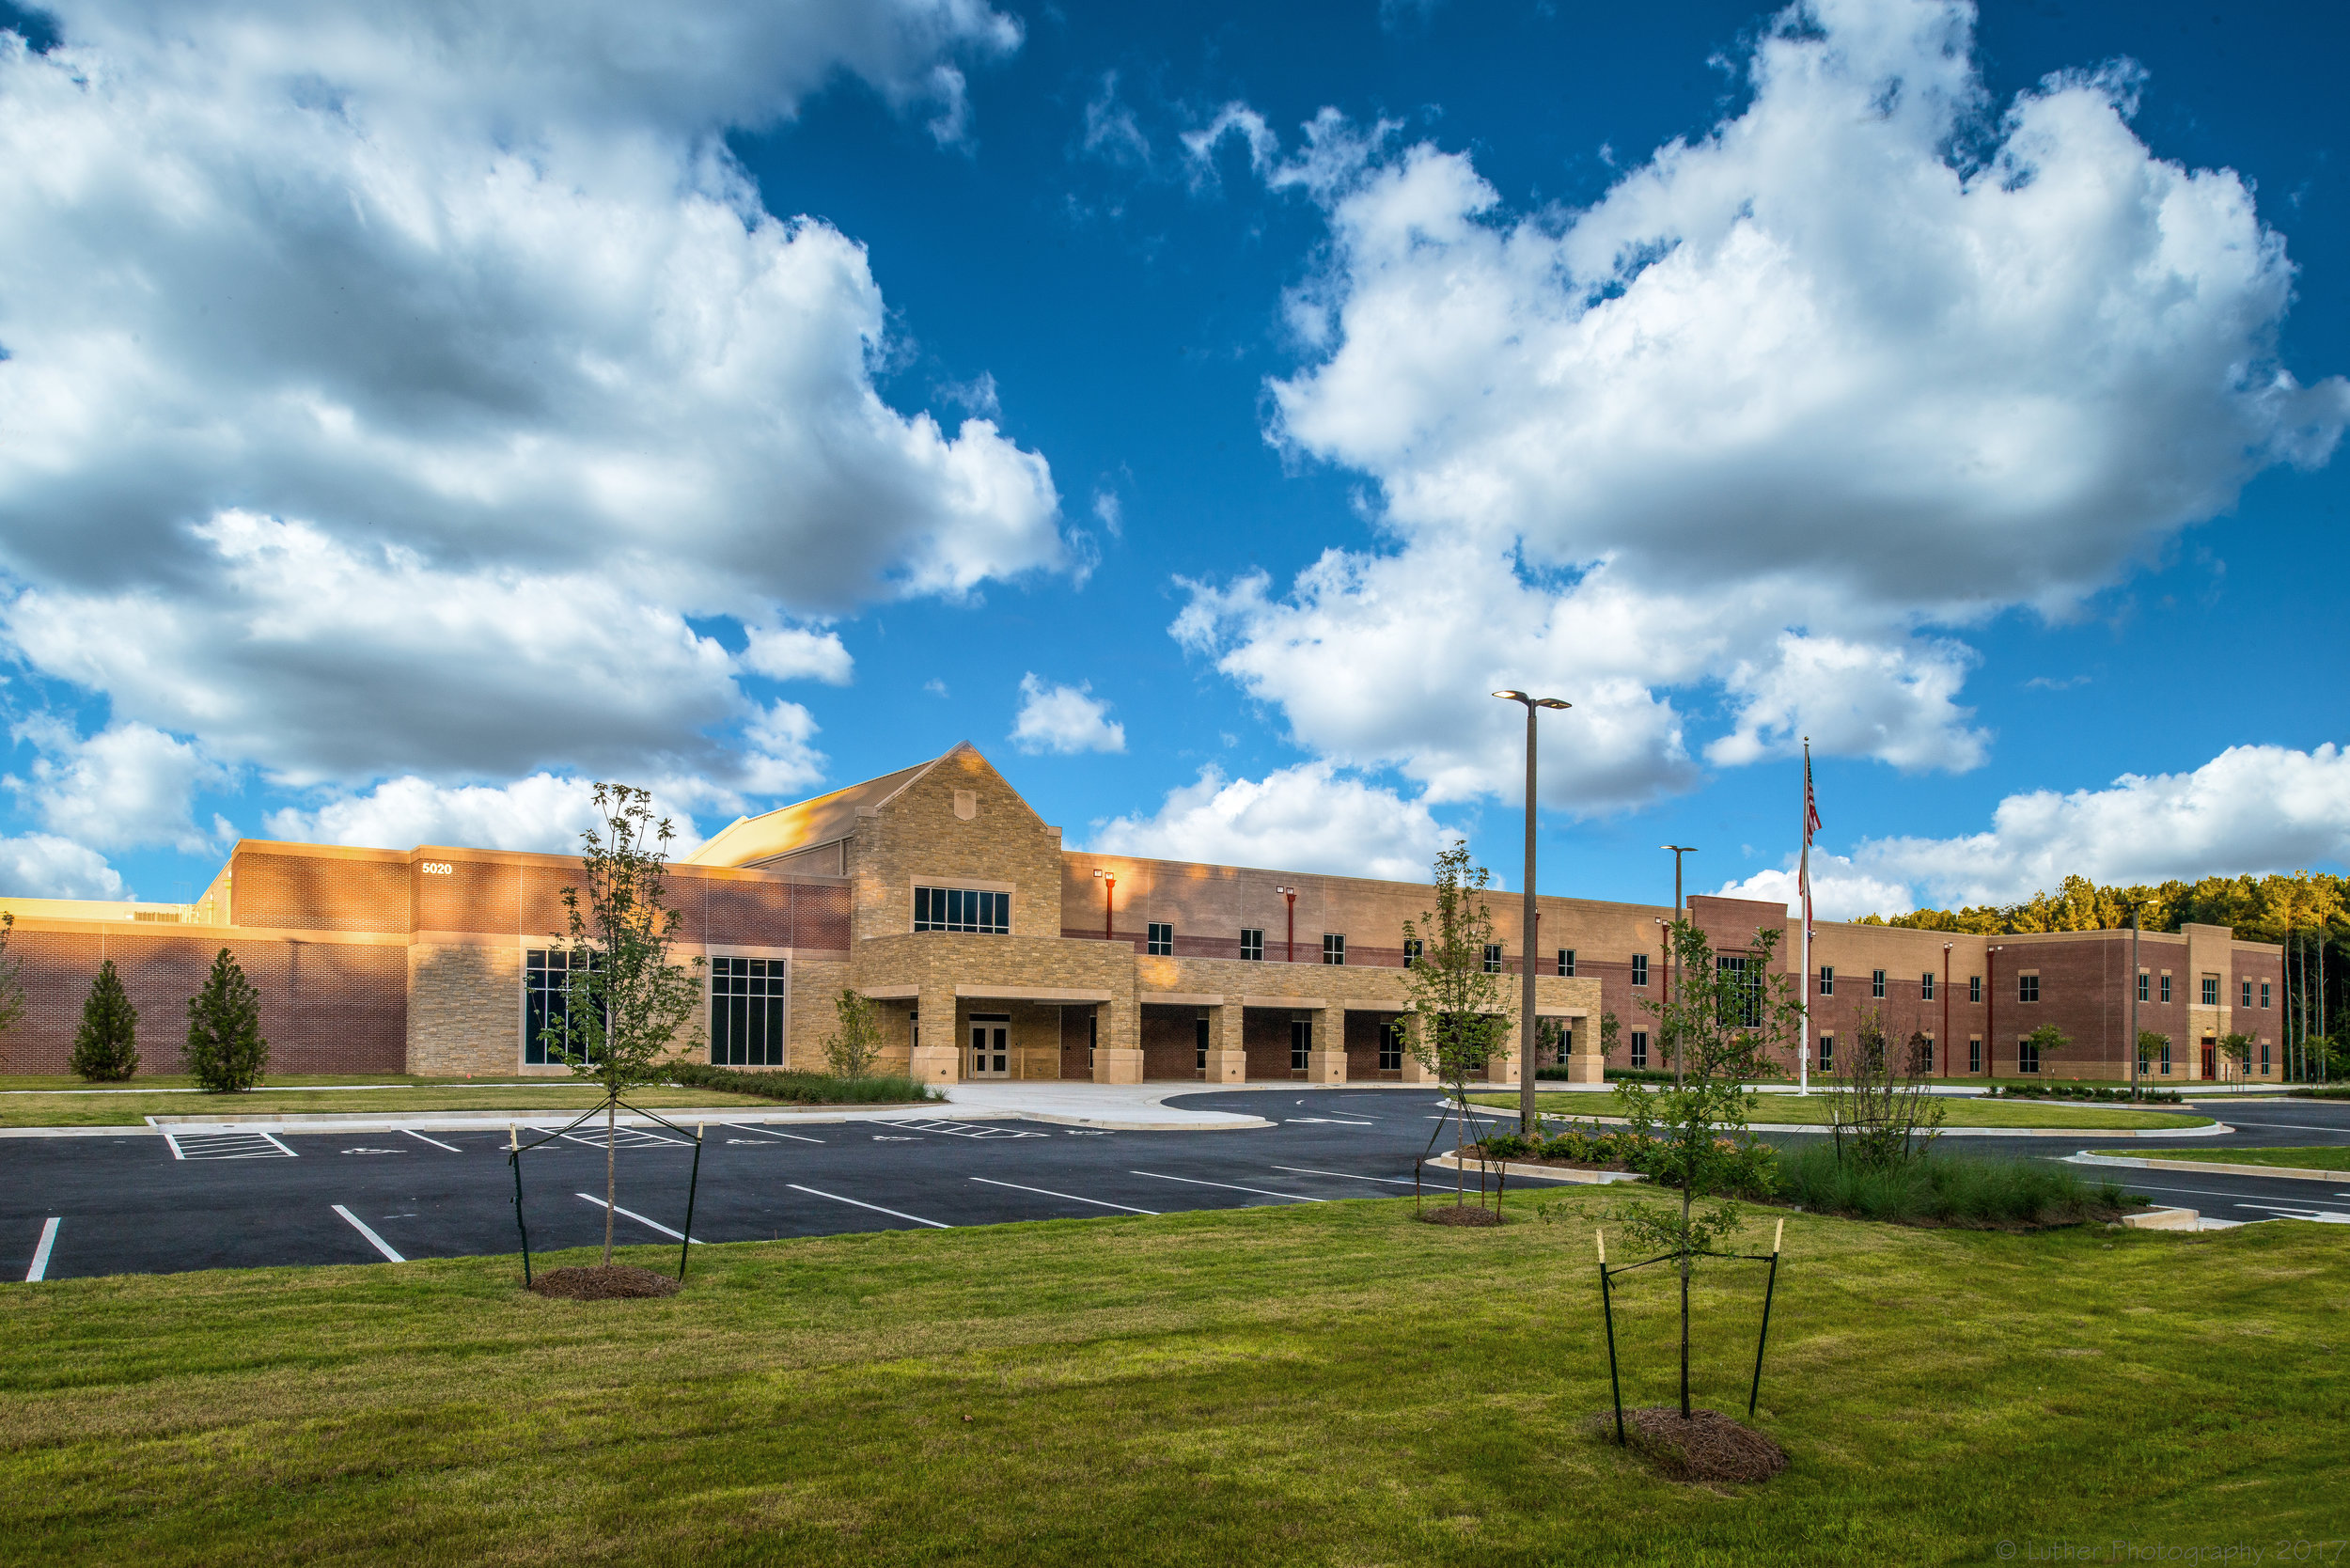 Lakeland Middle School